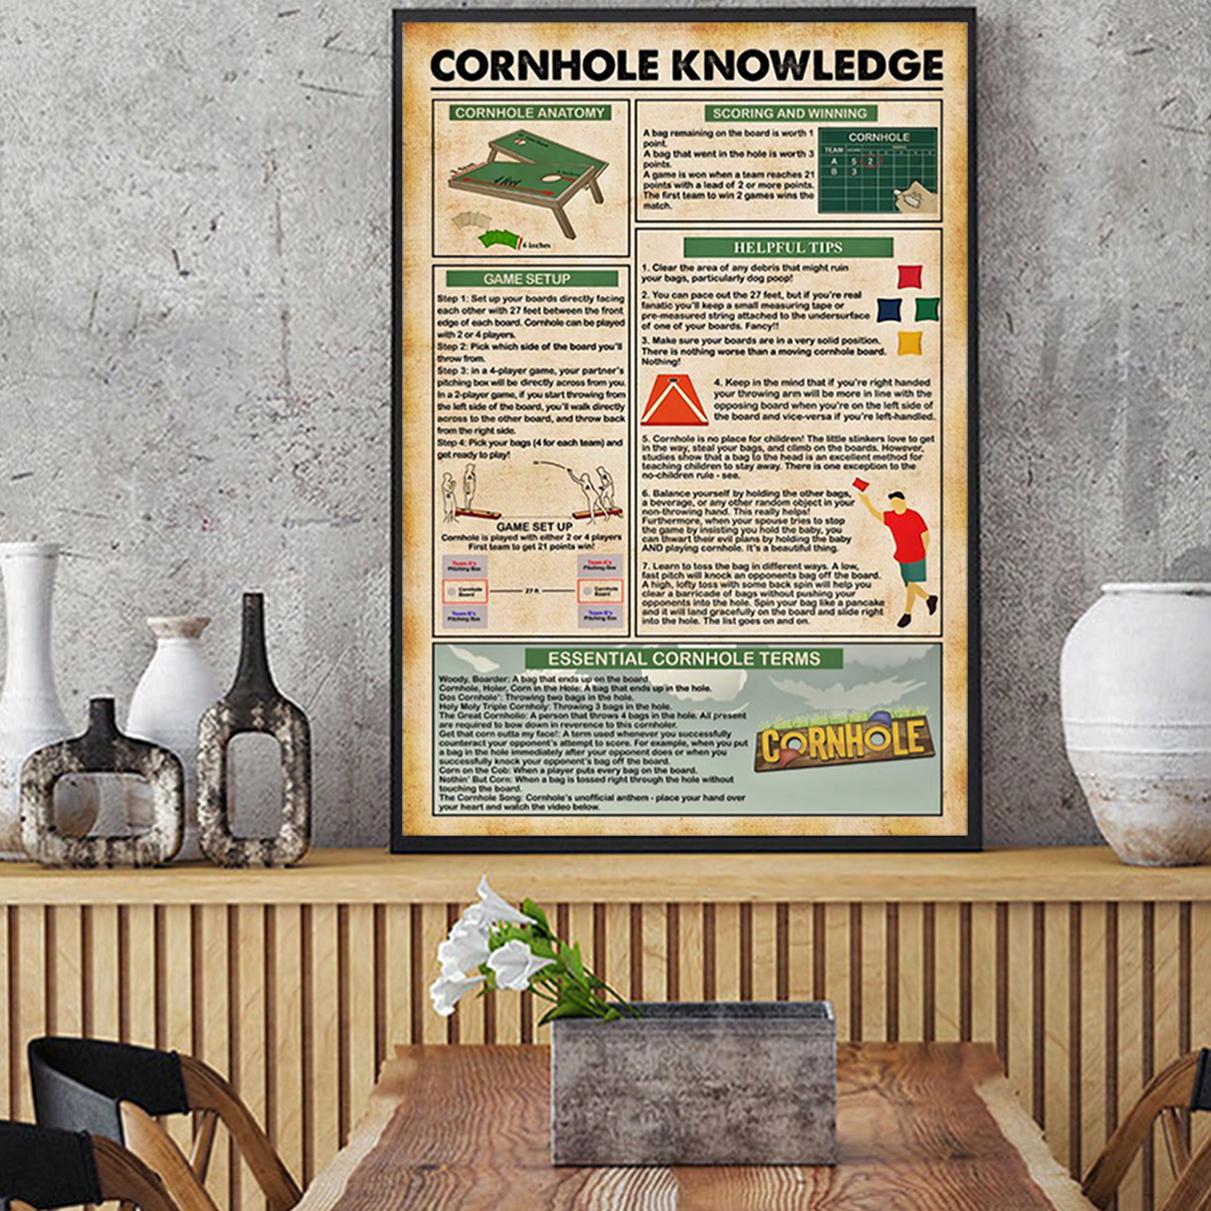 Cornhole knowledge poster A3